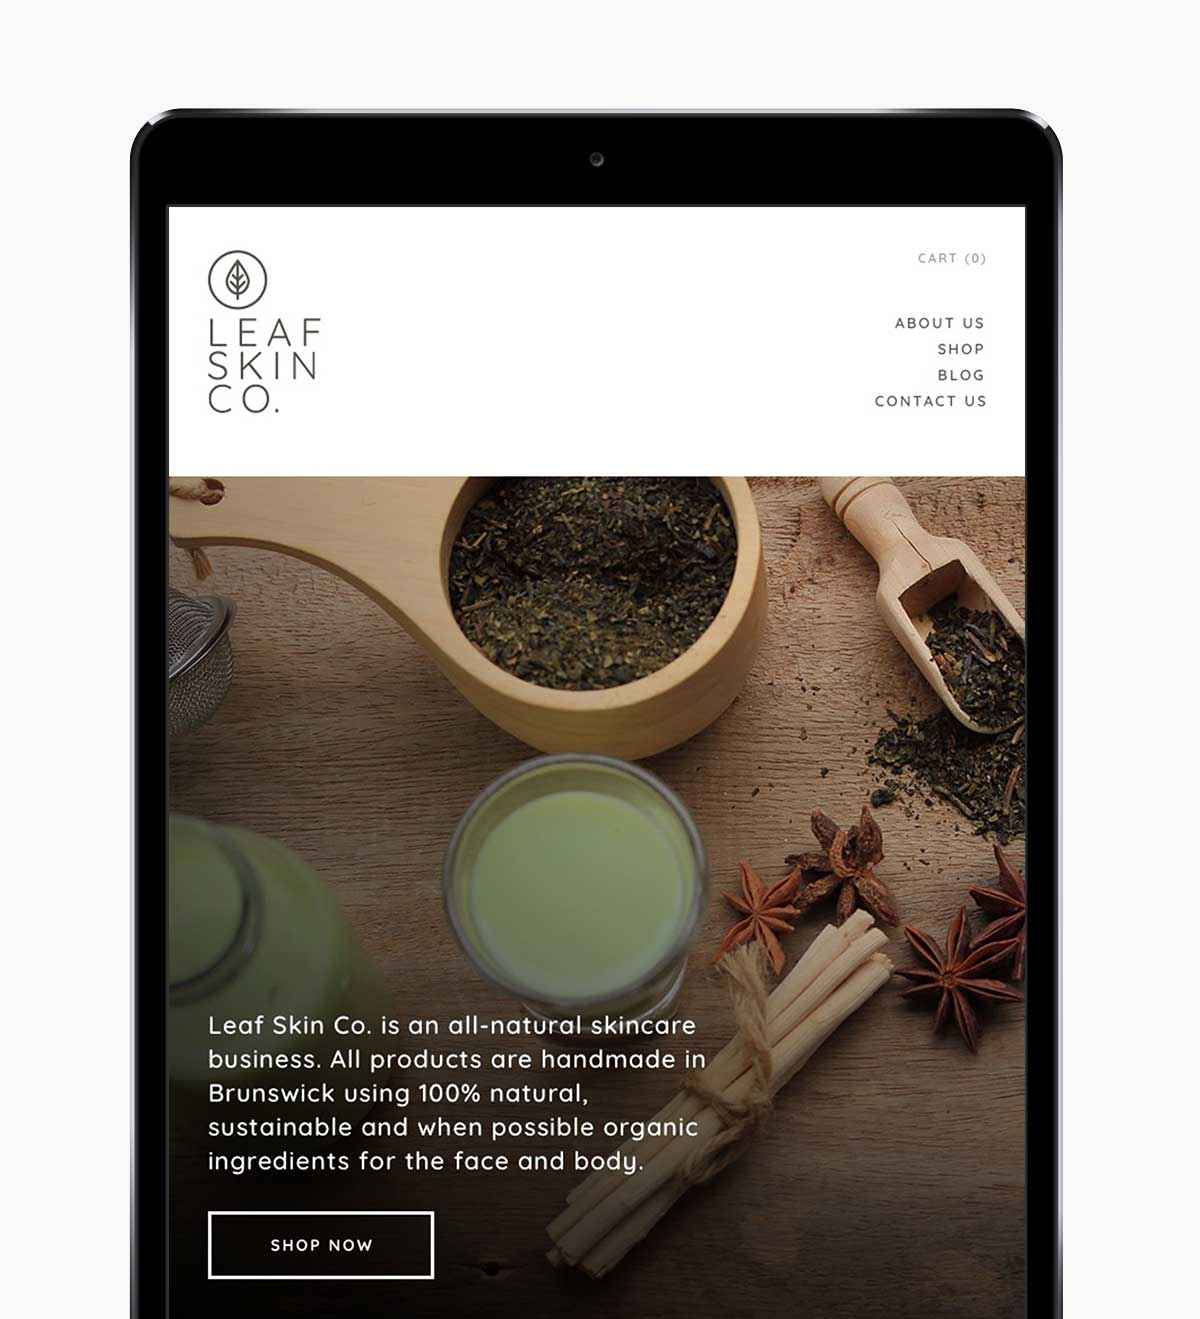 Leaf Skin Co. responsive website on iPad in portrait view